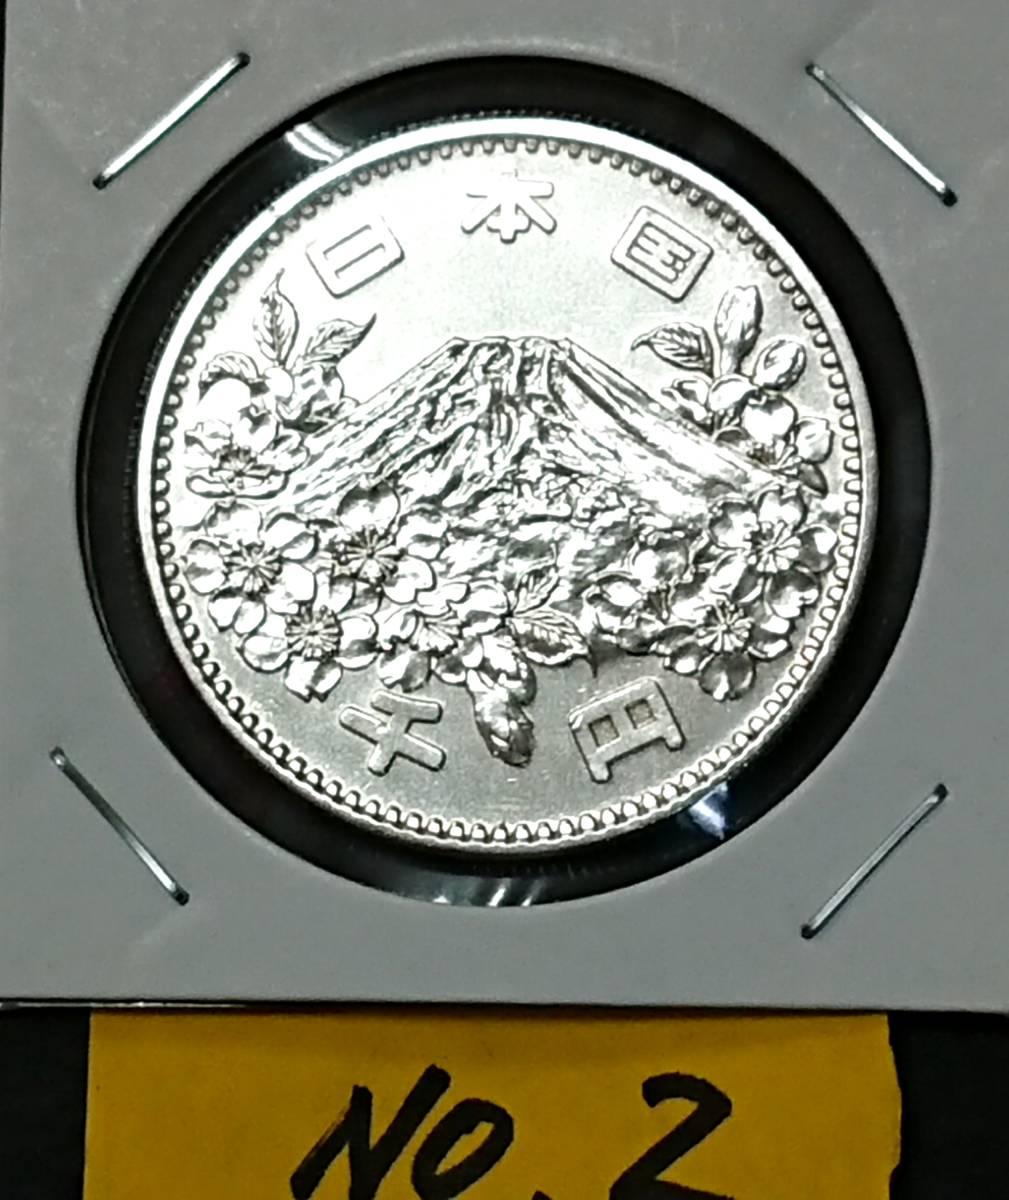 ☆昭和39年東京オリンピック記念1000円銀貨未使用美品《貨幣硬貨》②☆